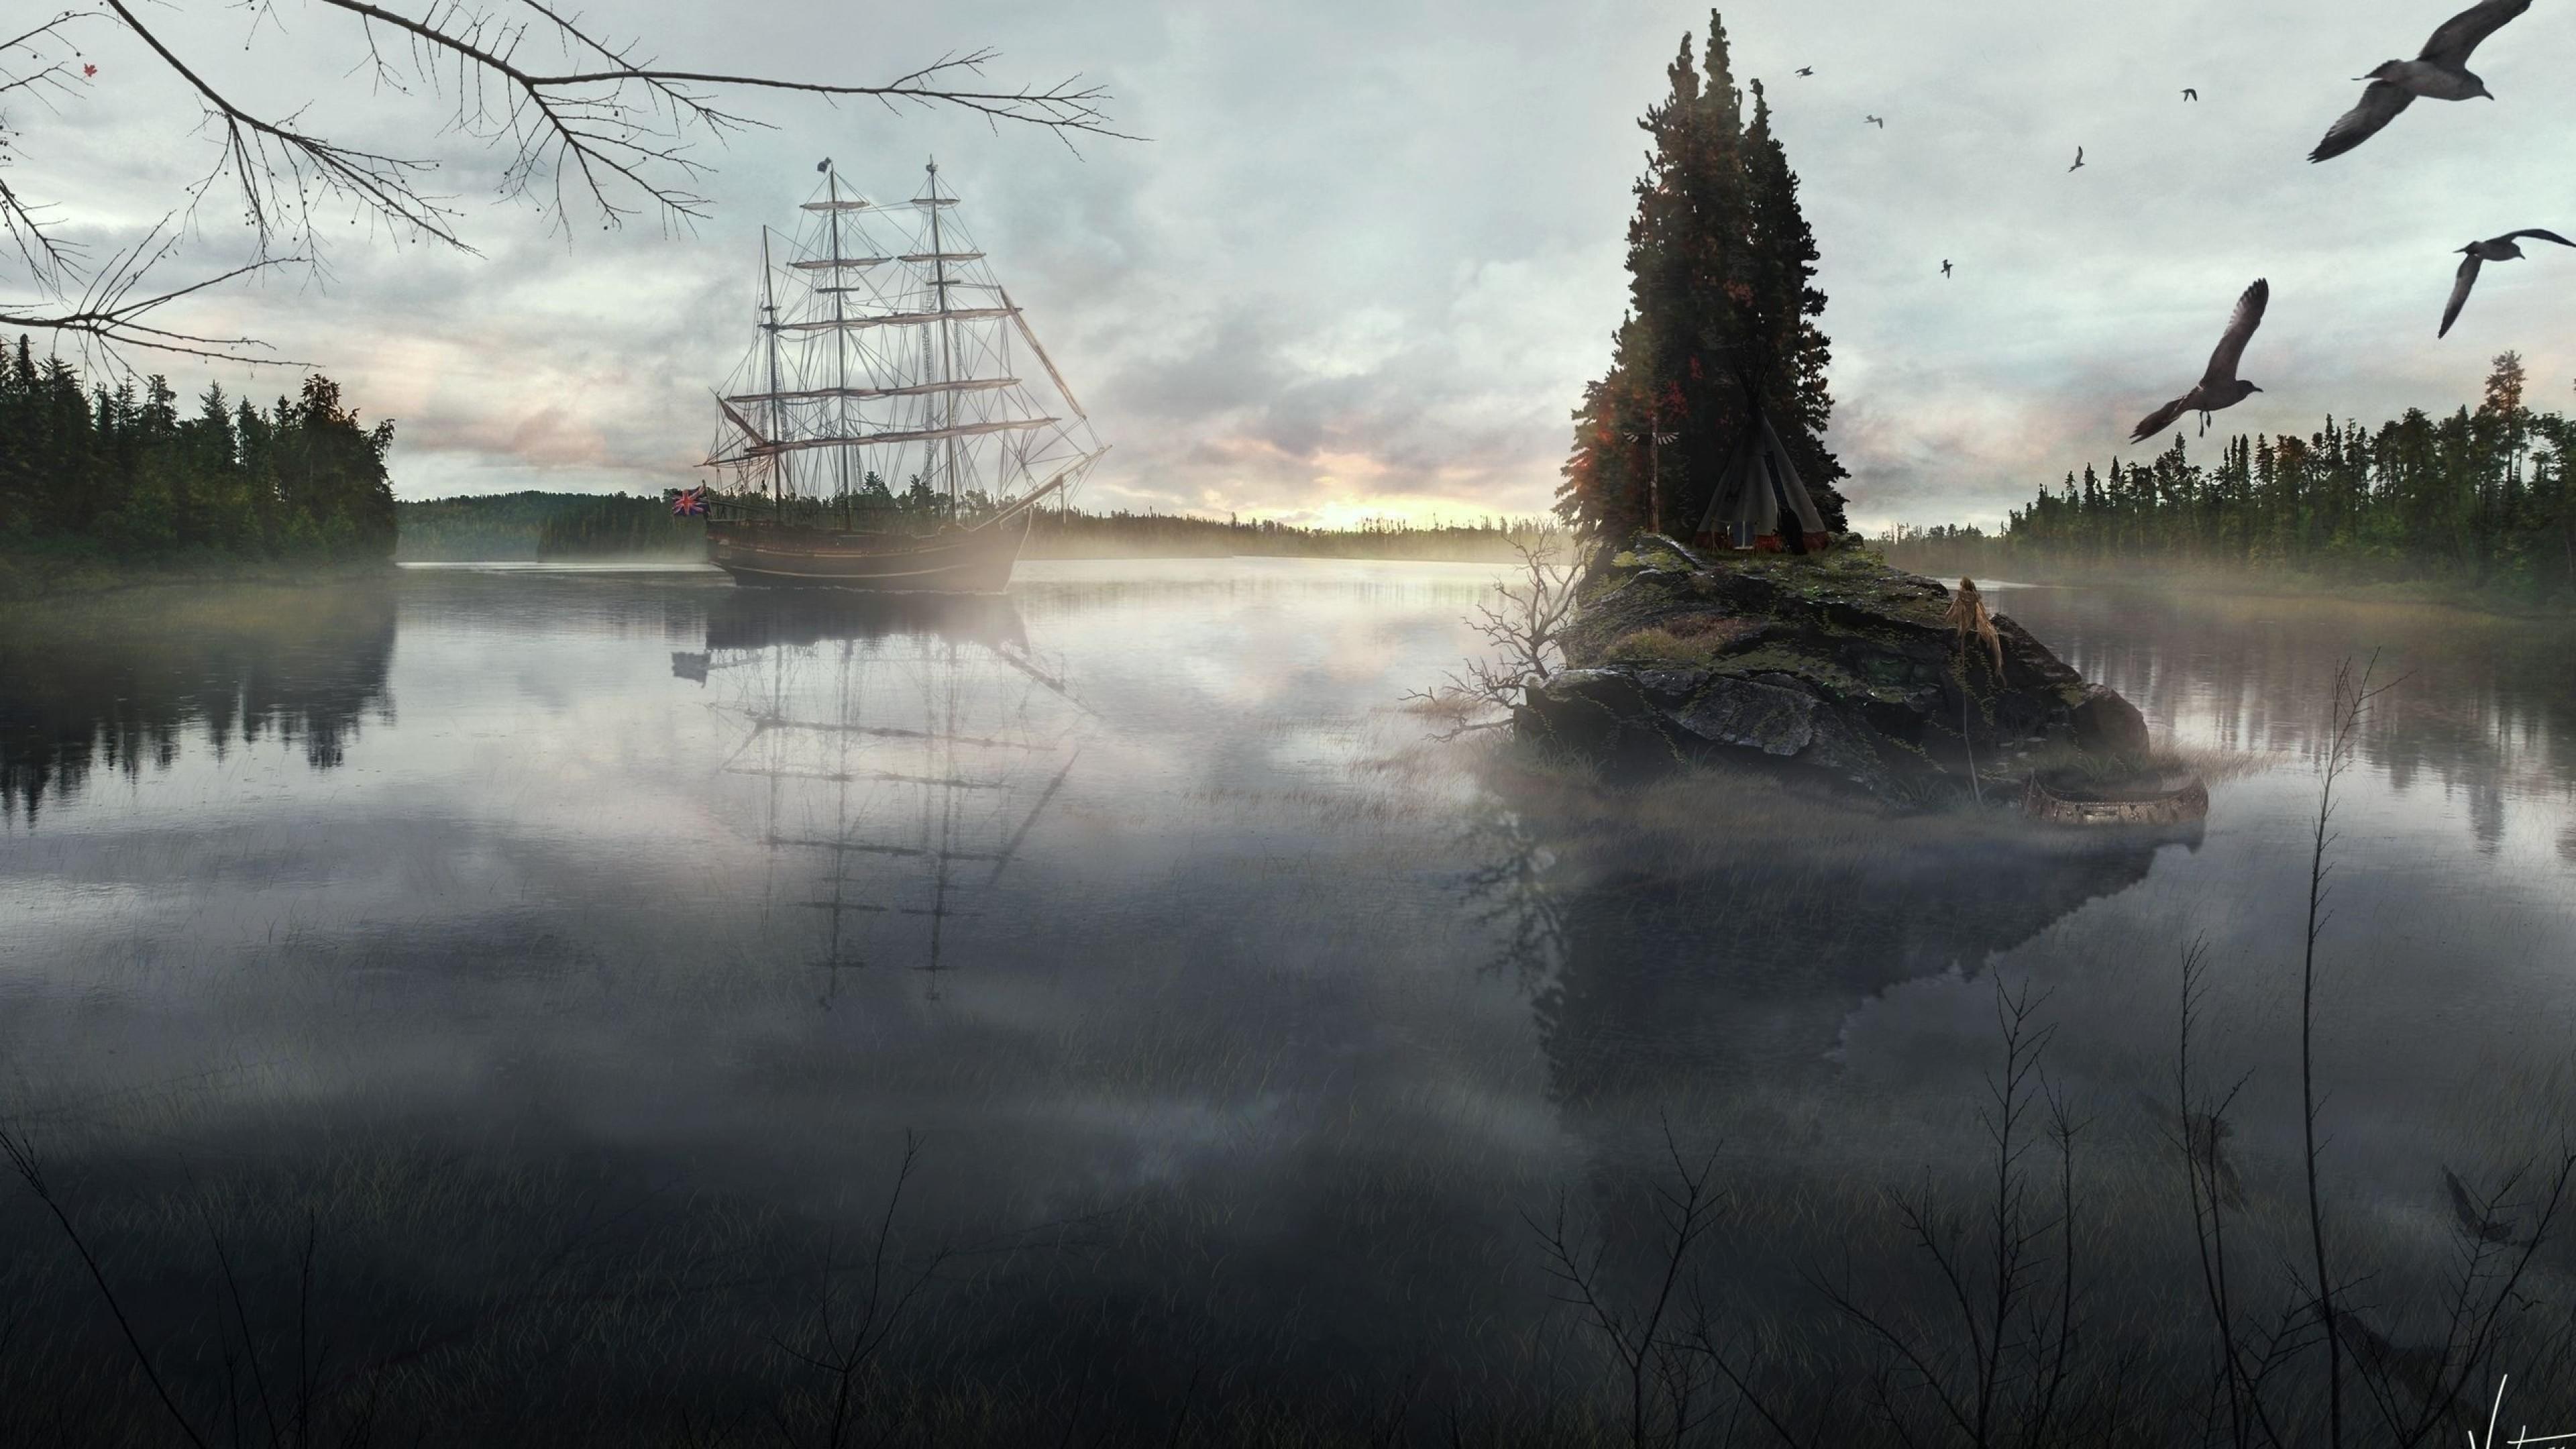 Wallpaper ship, sea, birds, island, tree, tent, haze,